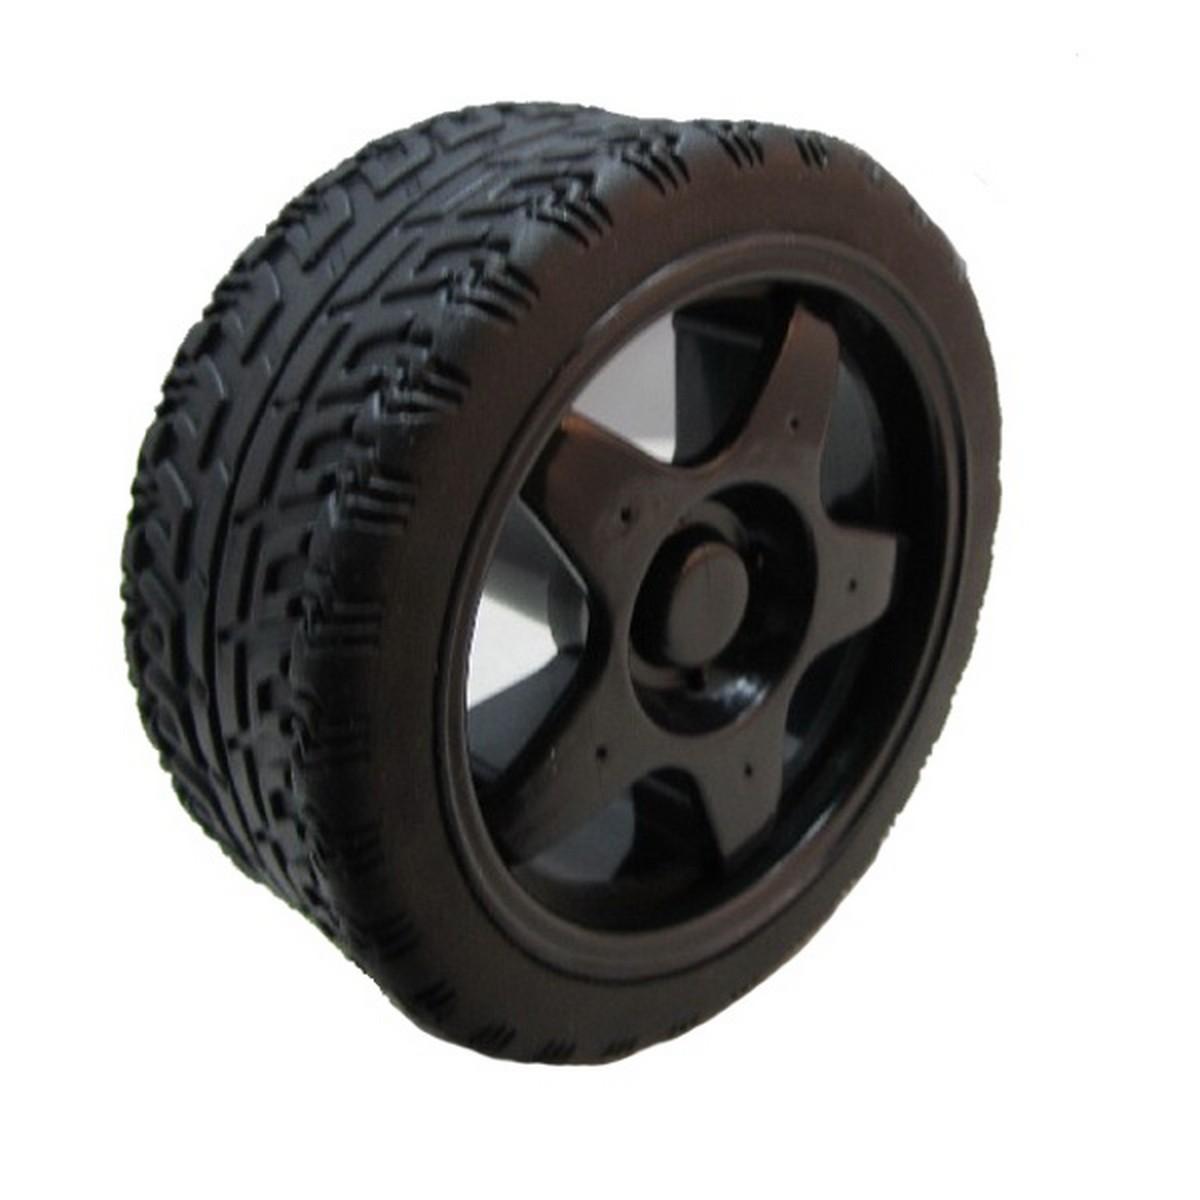 Black Tyre Wheel for Smart Robotic Car